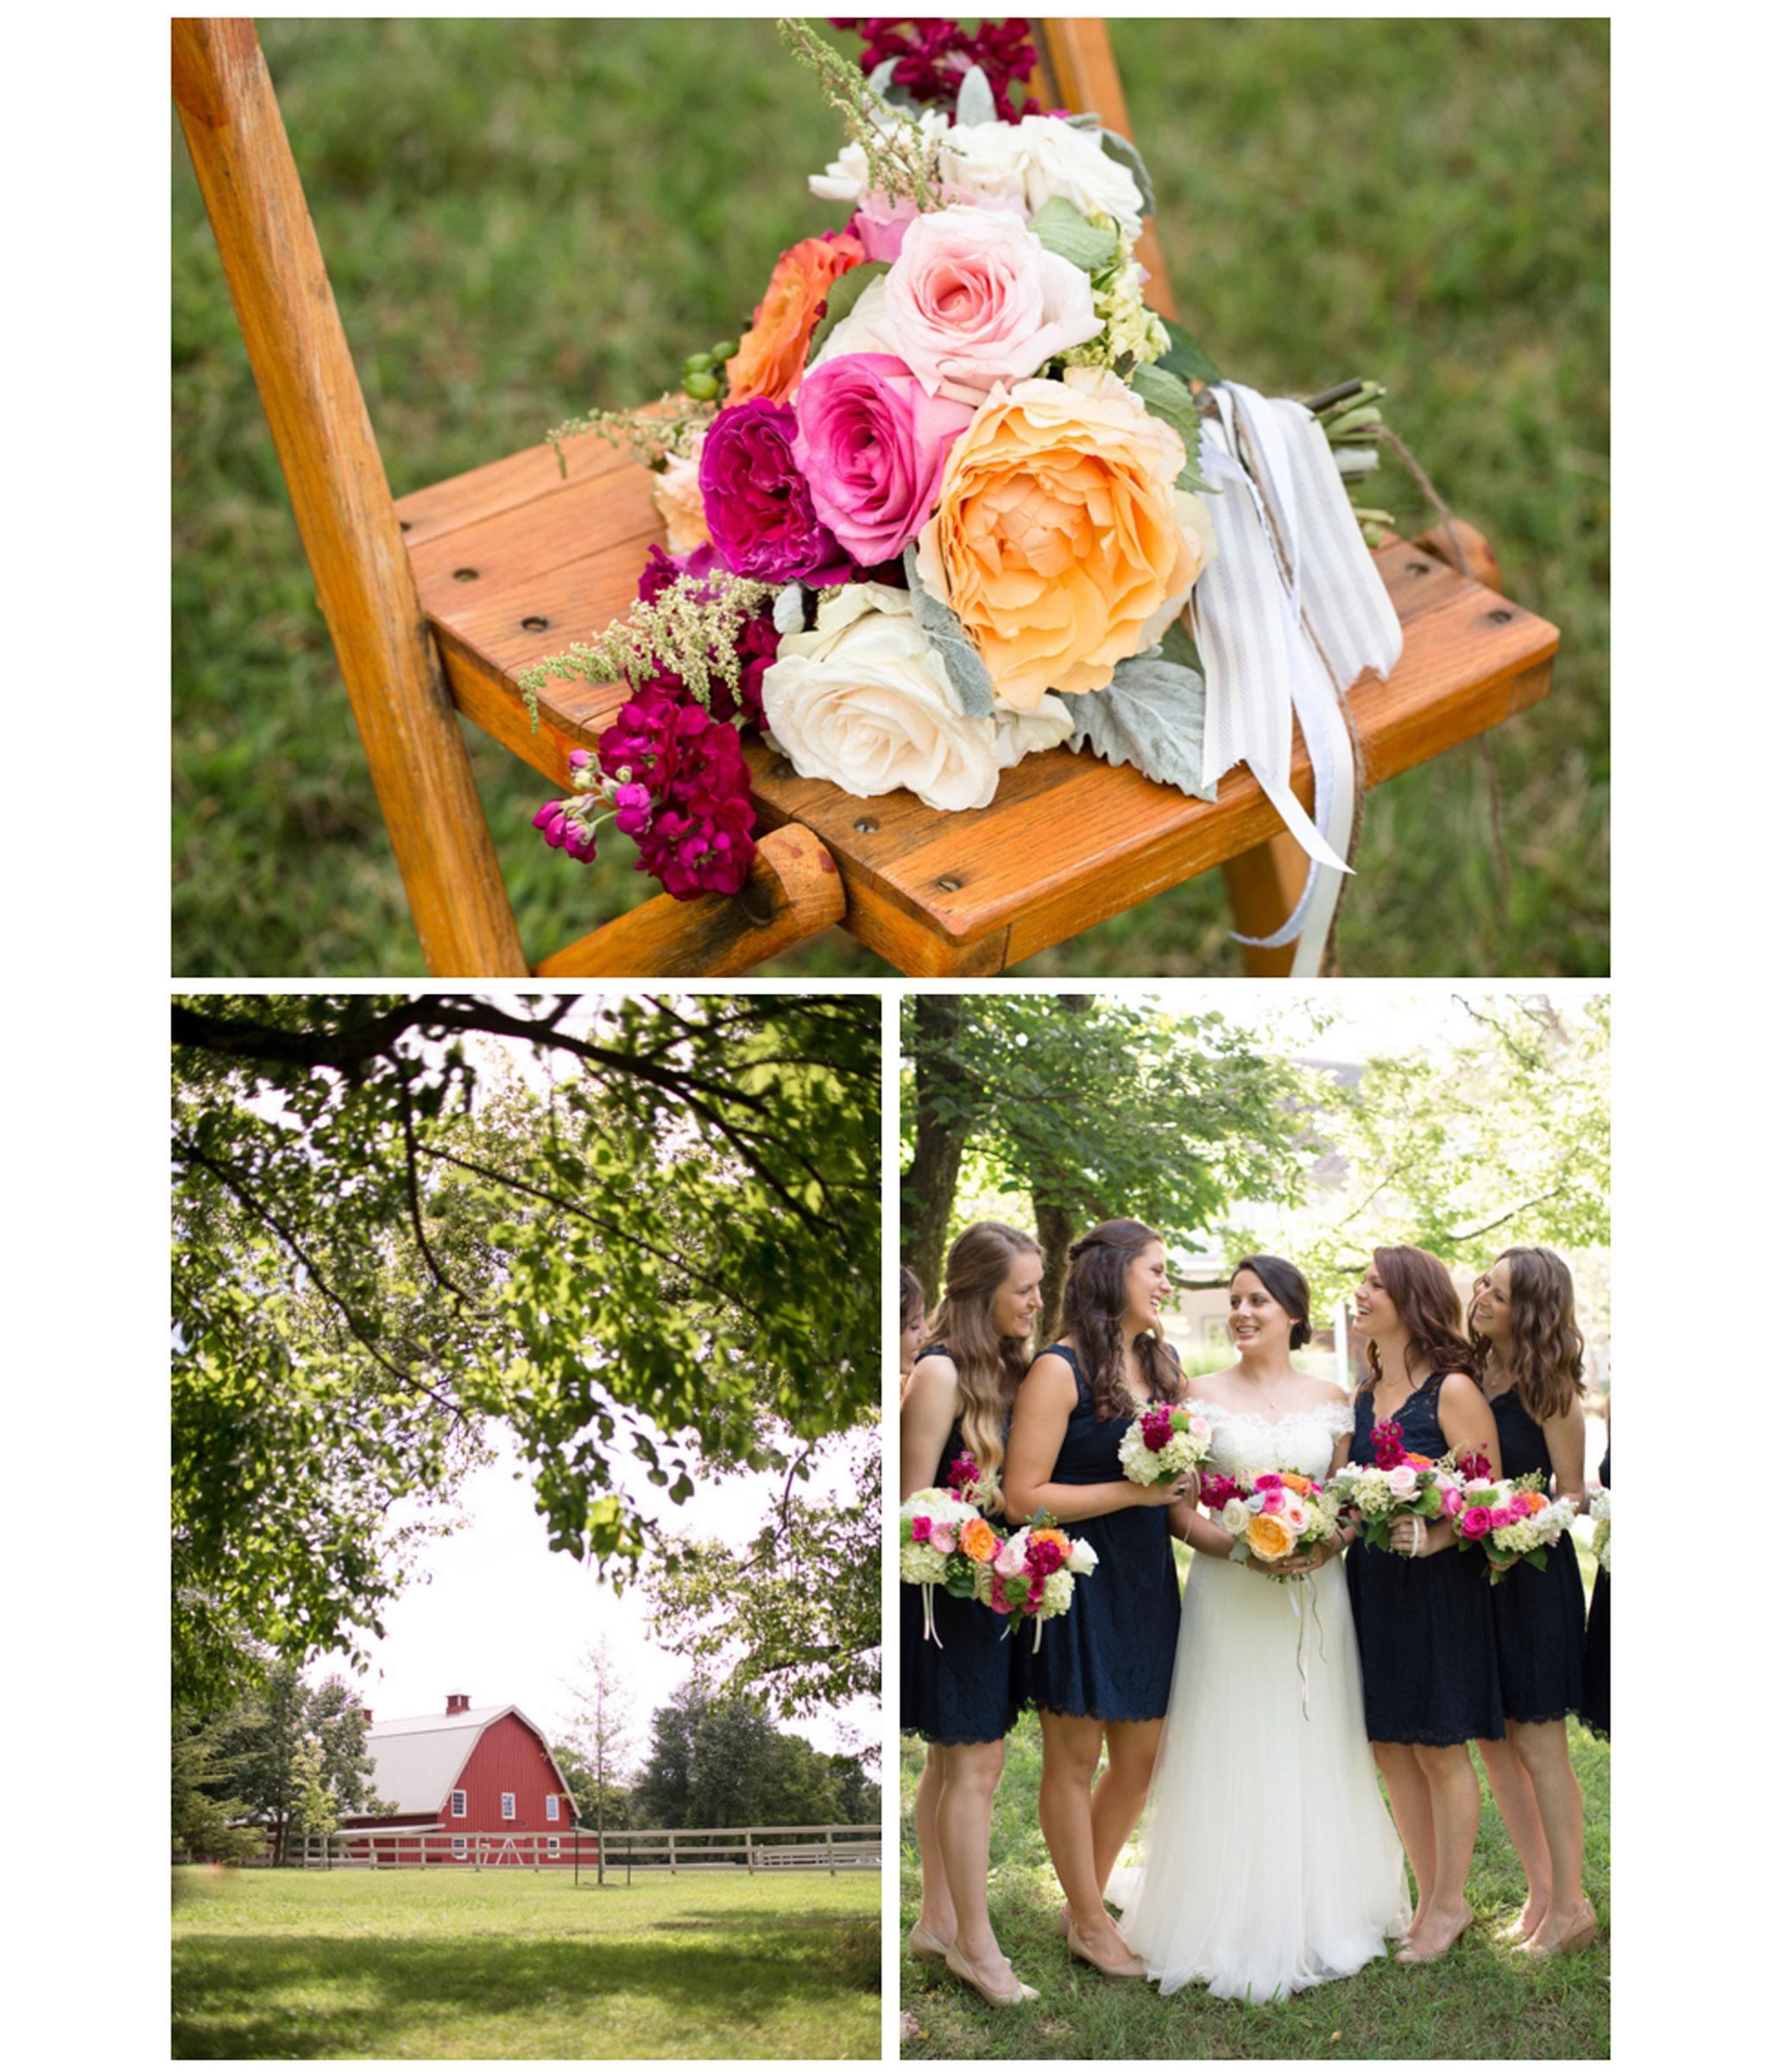 Brideside_02.jpg